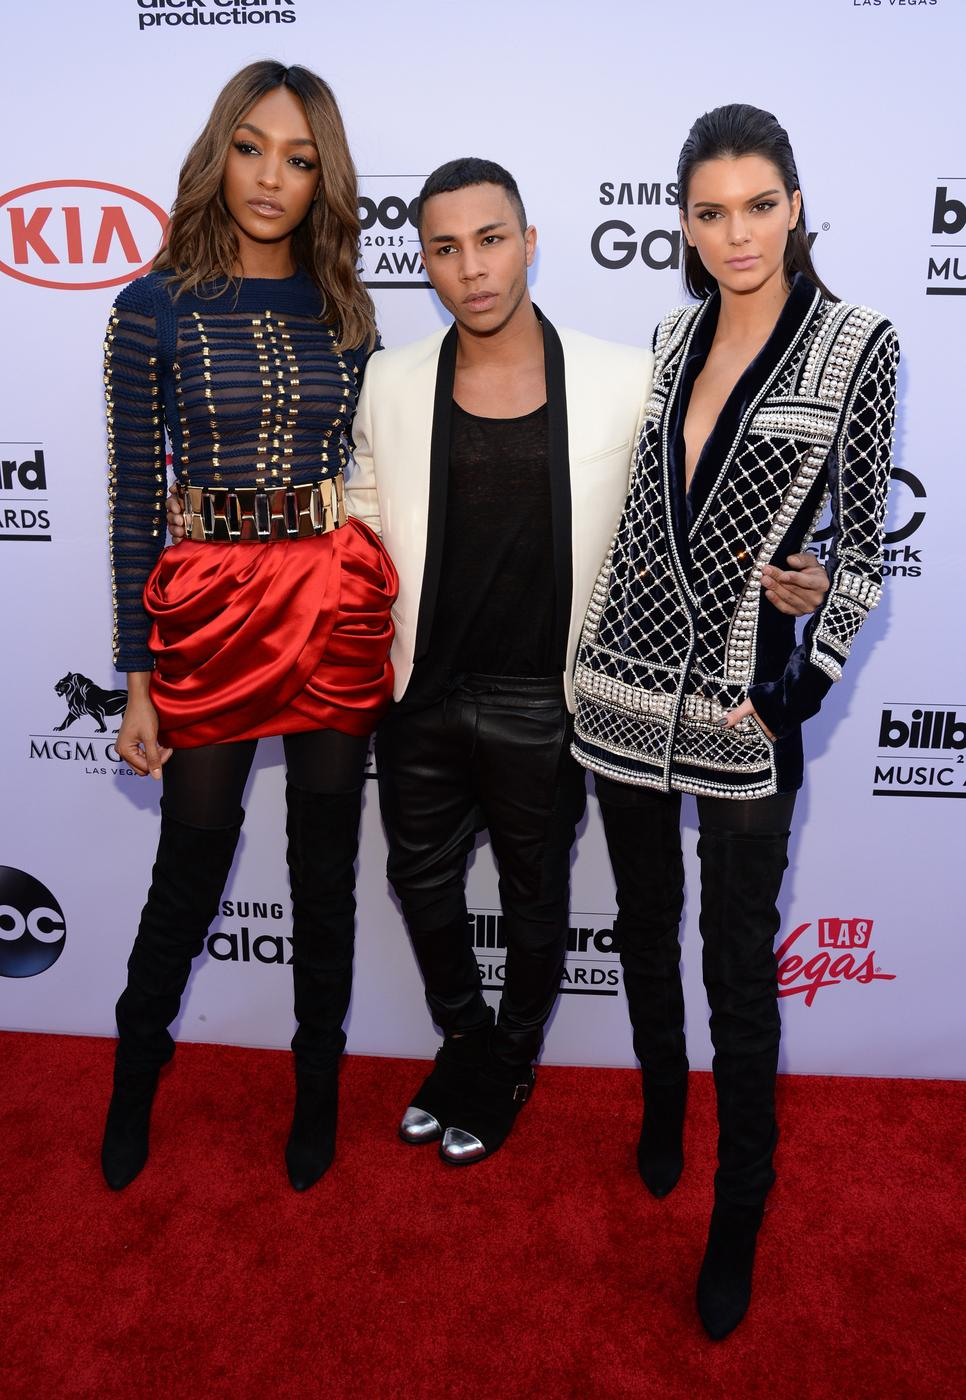 Get set for Balmainia: Kendall Jenner and Jourdan Dunn announce Balmain for H&M at the BBMAs